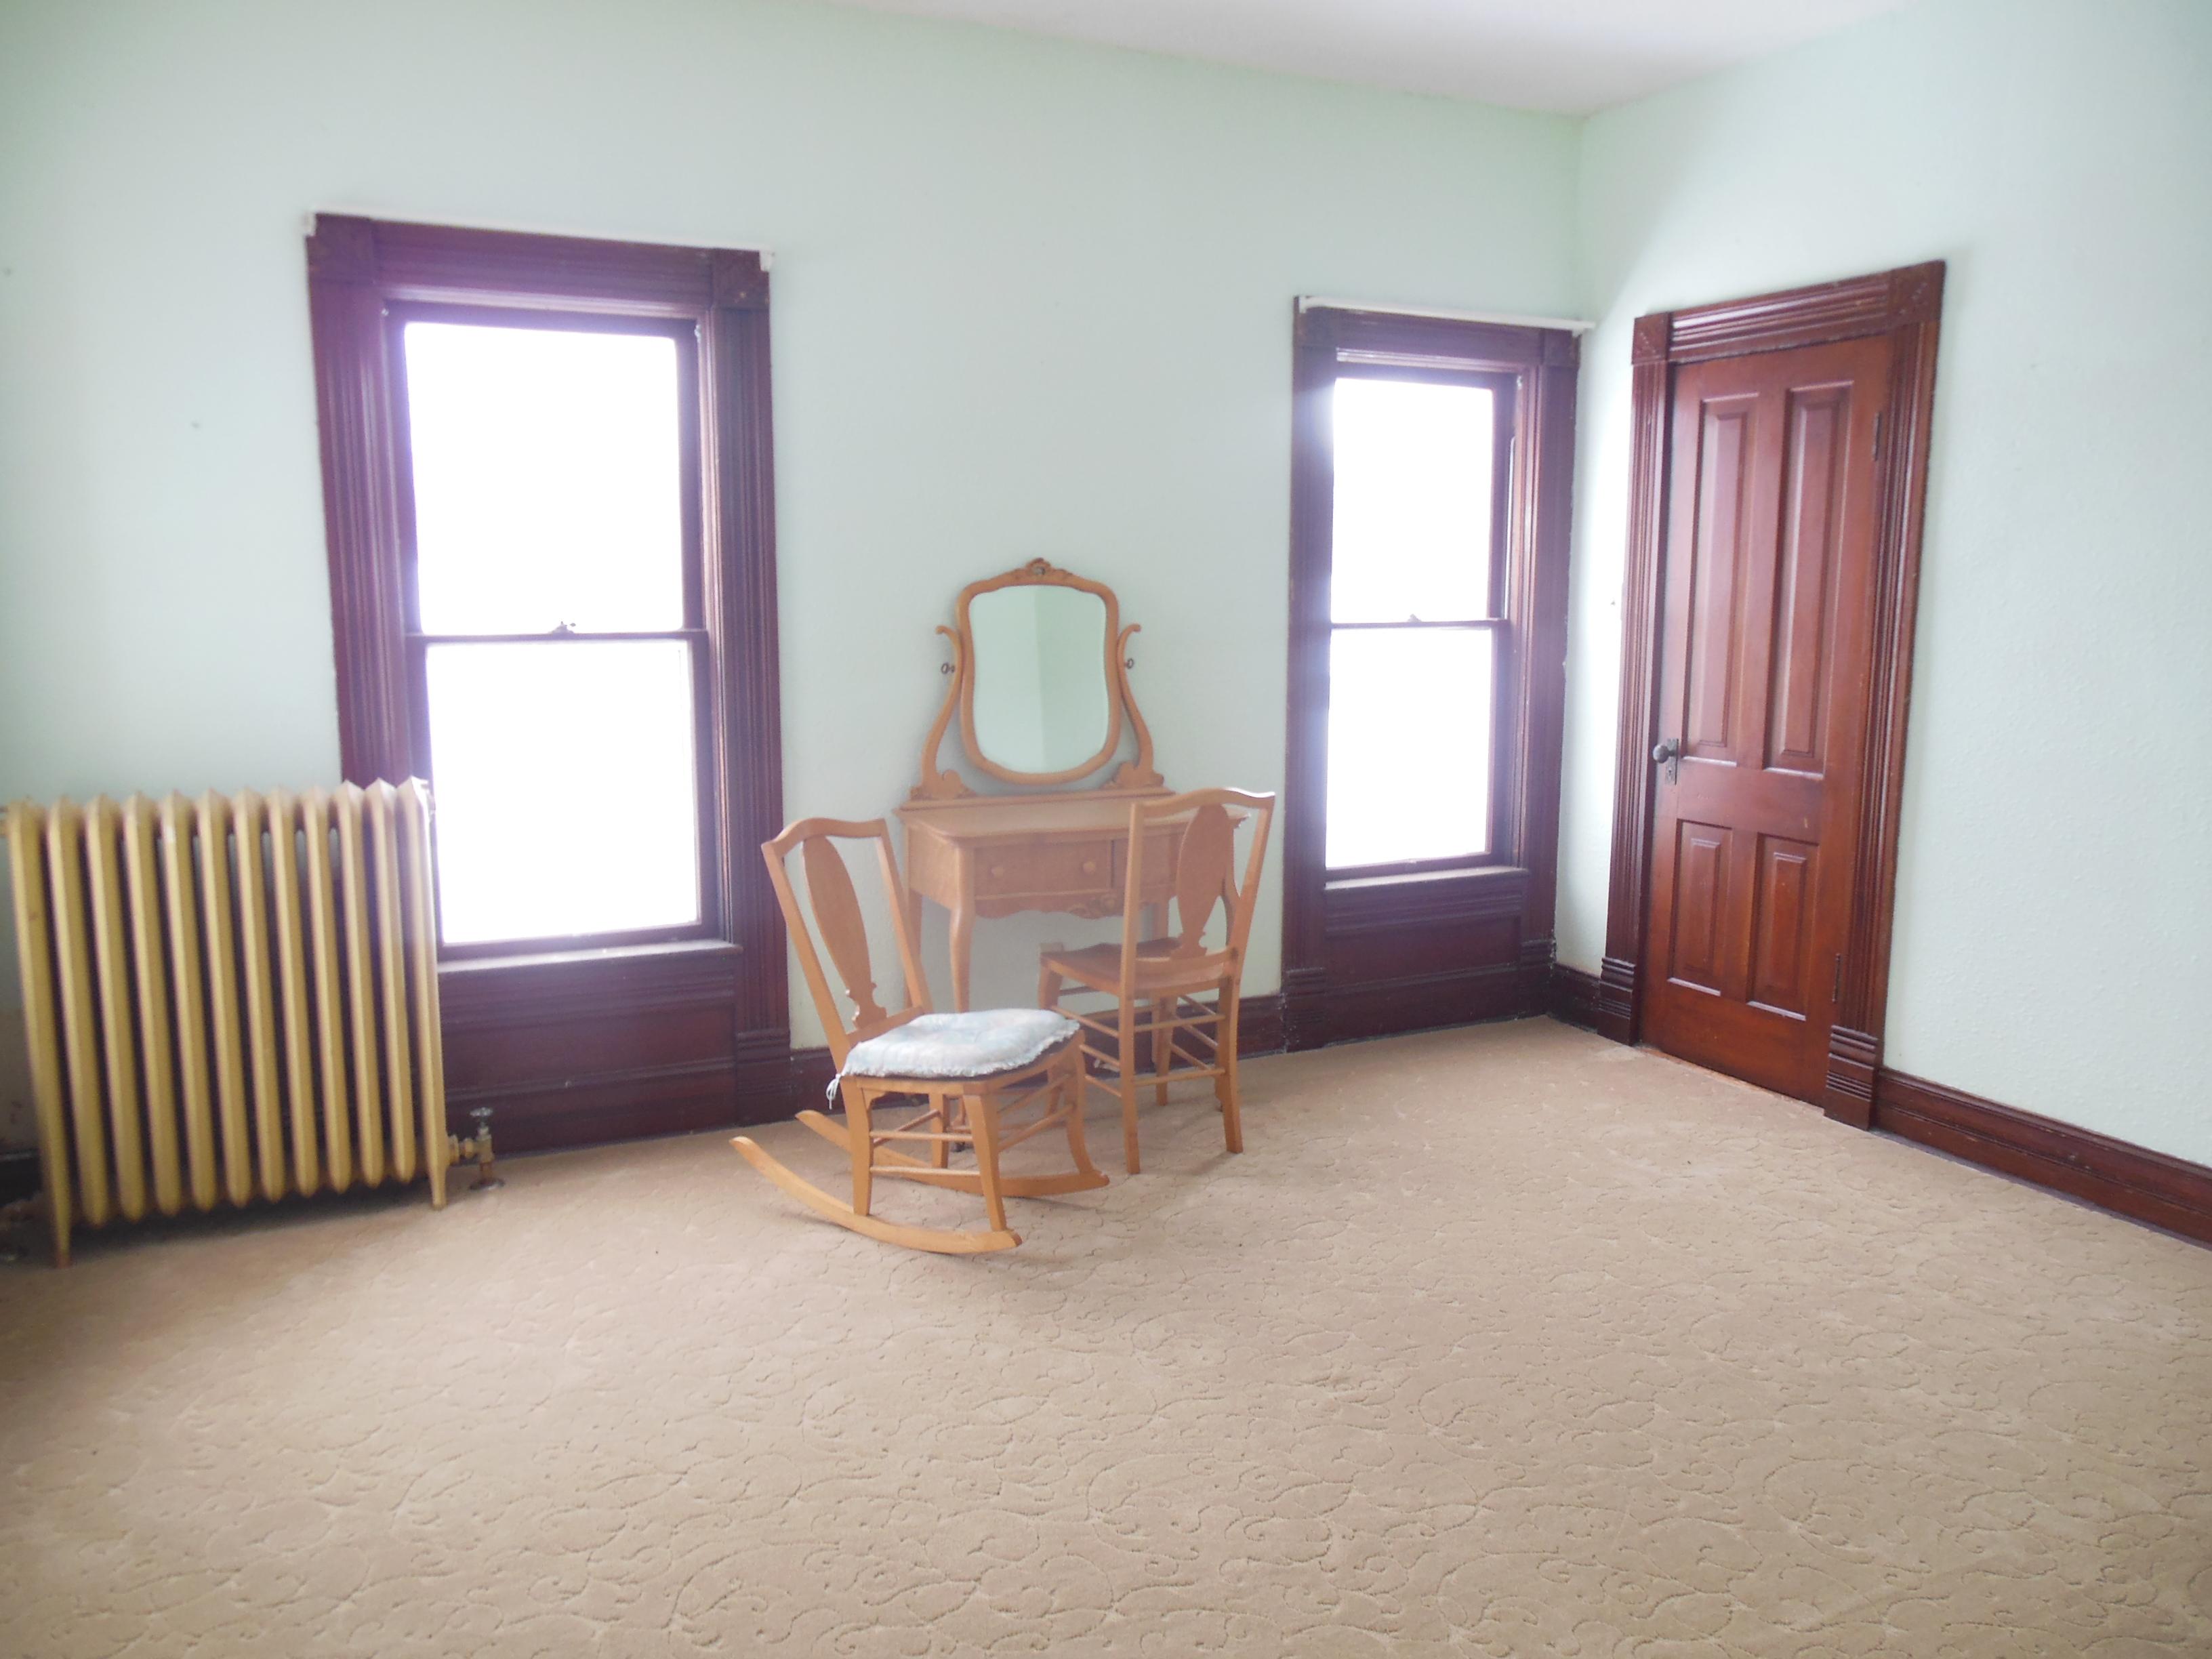 509 Normal Upstairs bedroom